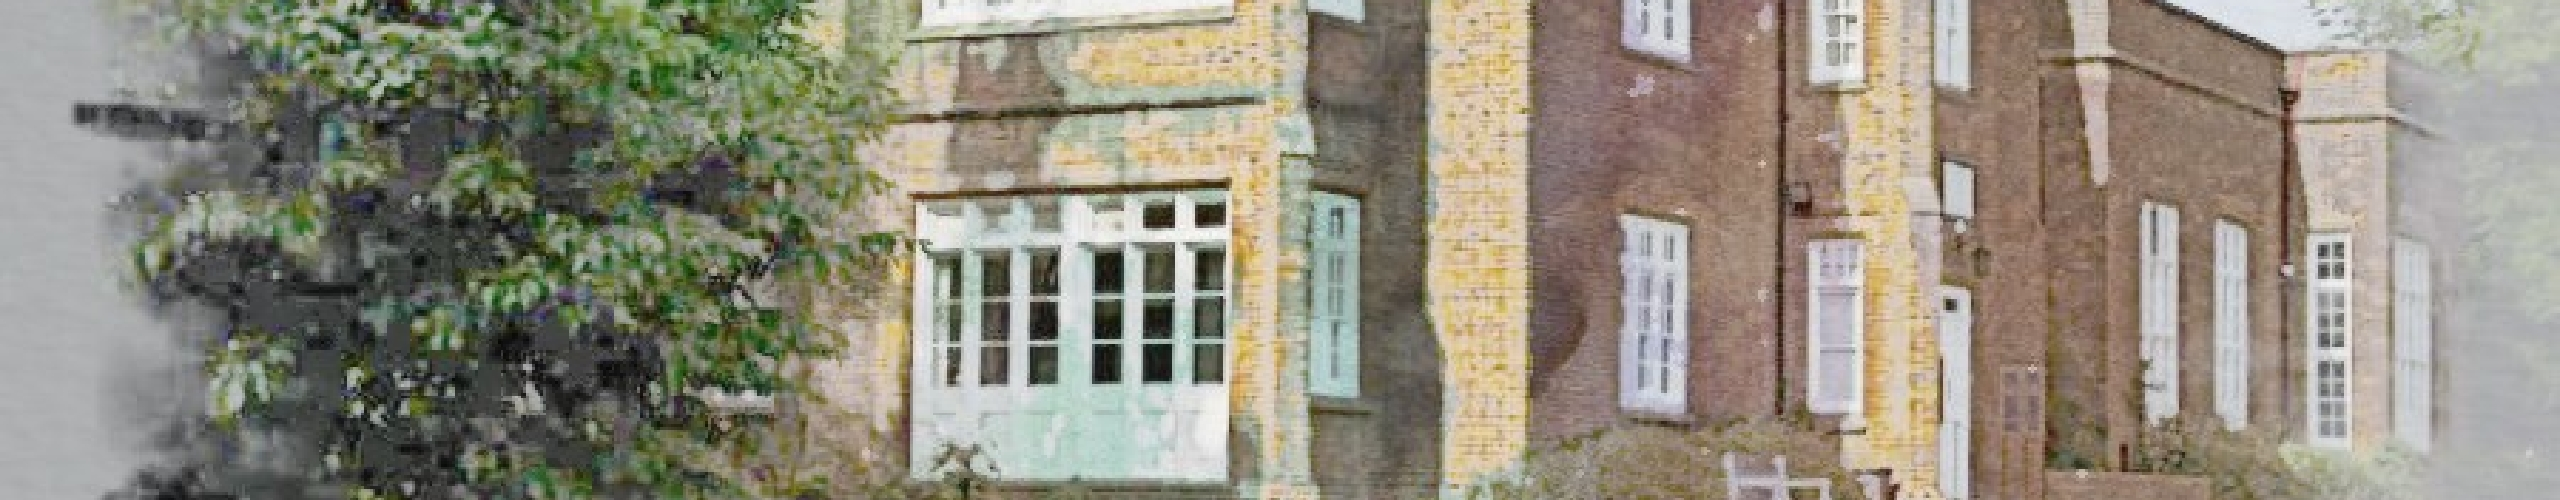 Origins of Uttlesford's towns panel background